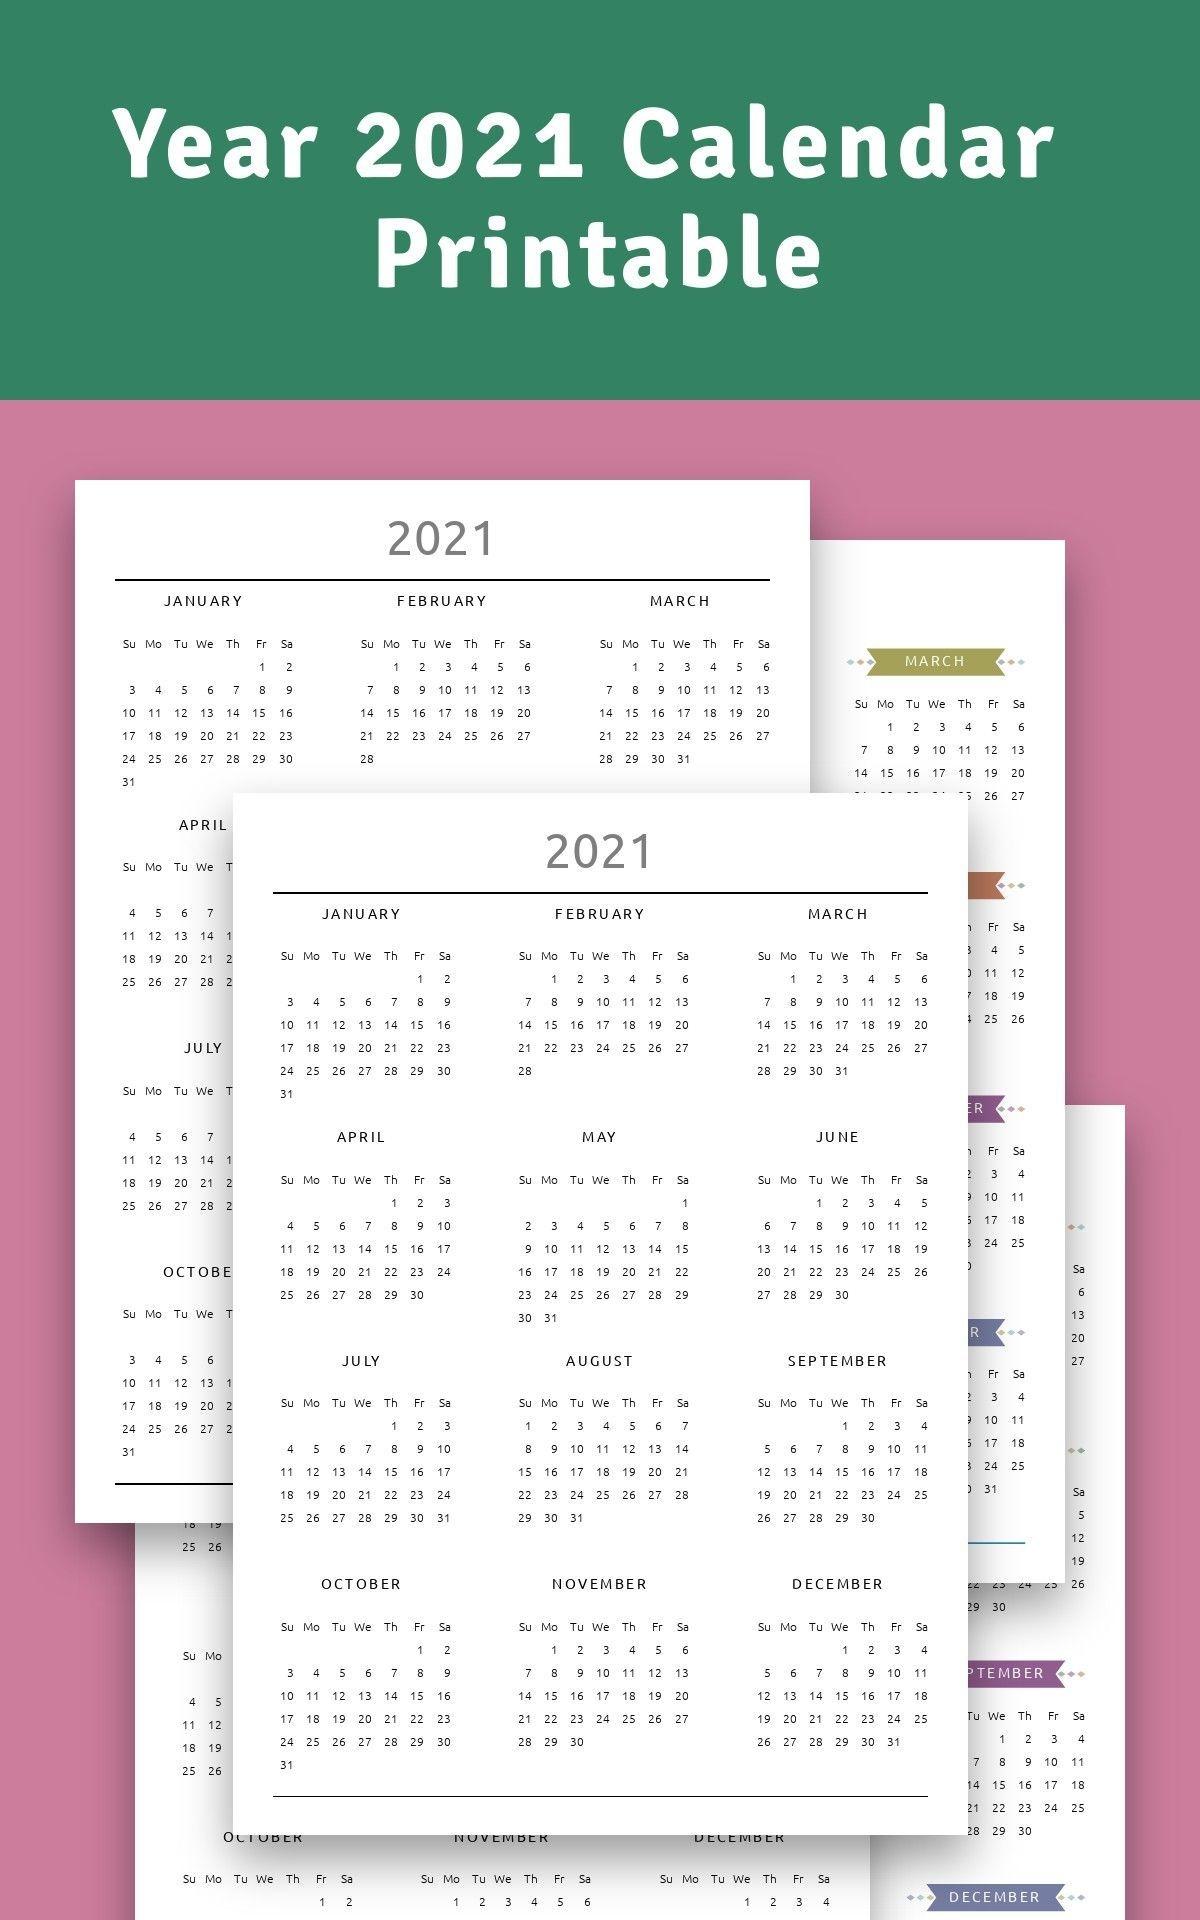 Year 2021 Calendar Printable Download Template In 2020